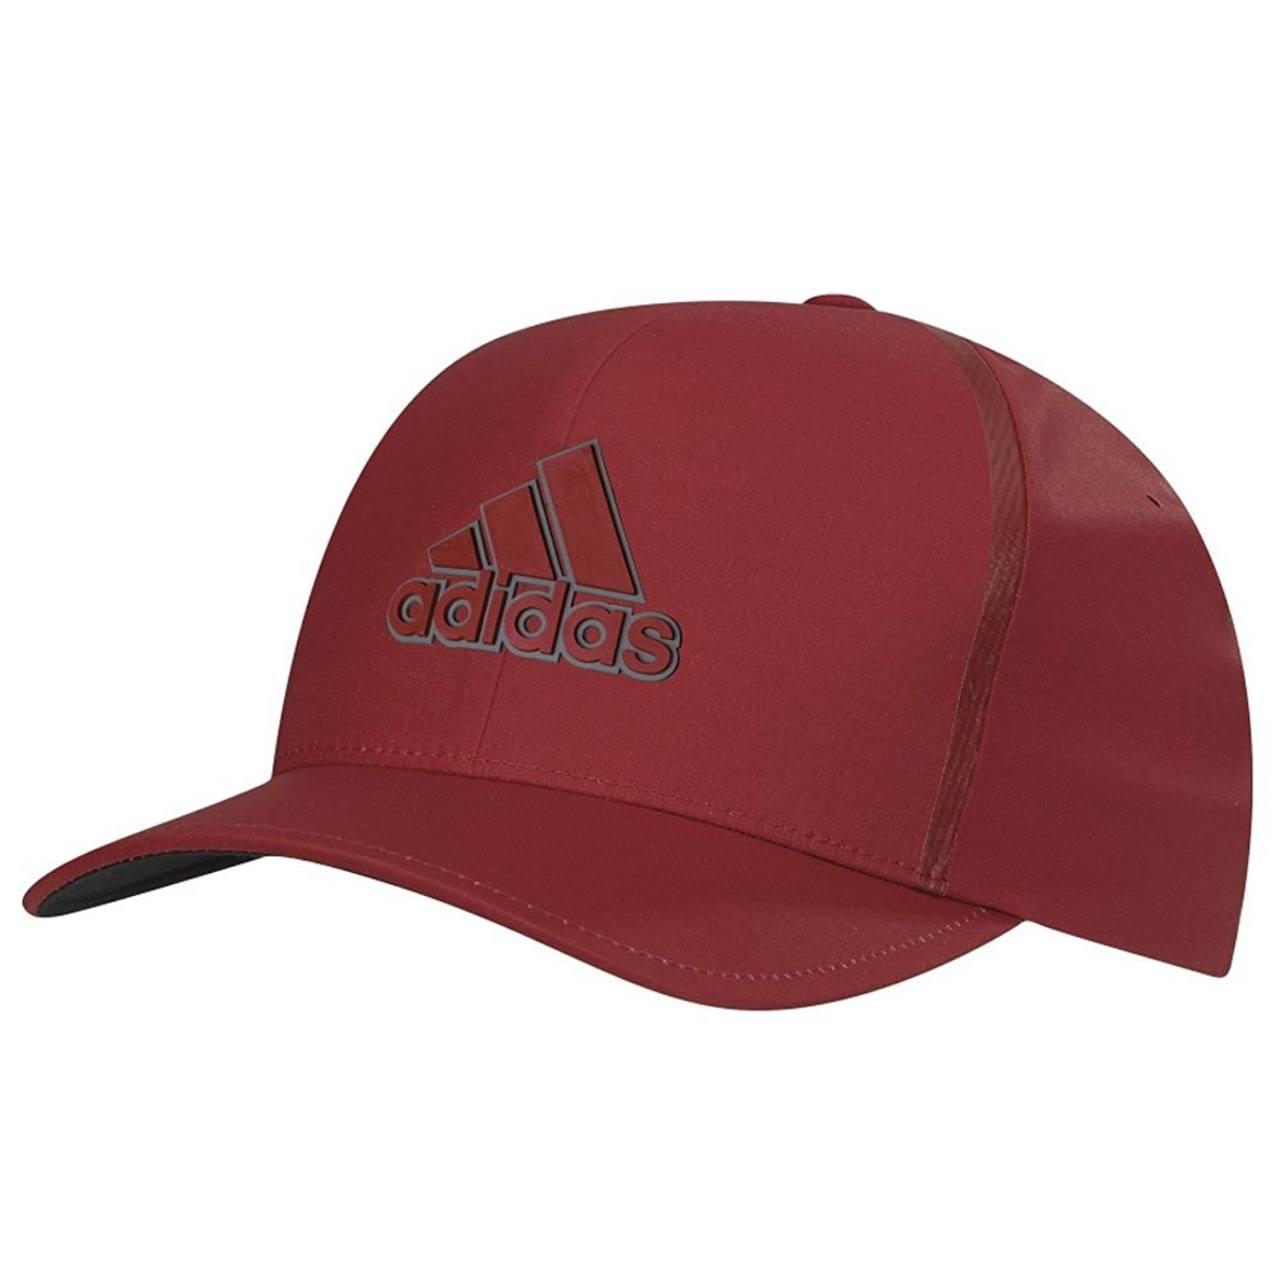 0f10ed3c78f NEW Adidas TaylorMade Tour Delta Textured Flexfit Golf Caps – Pro ...